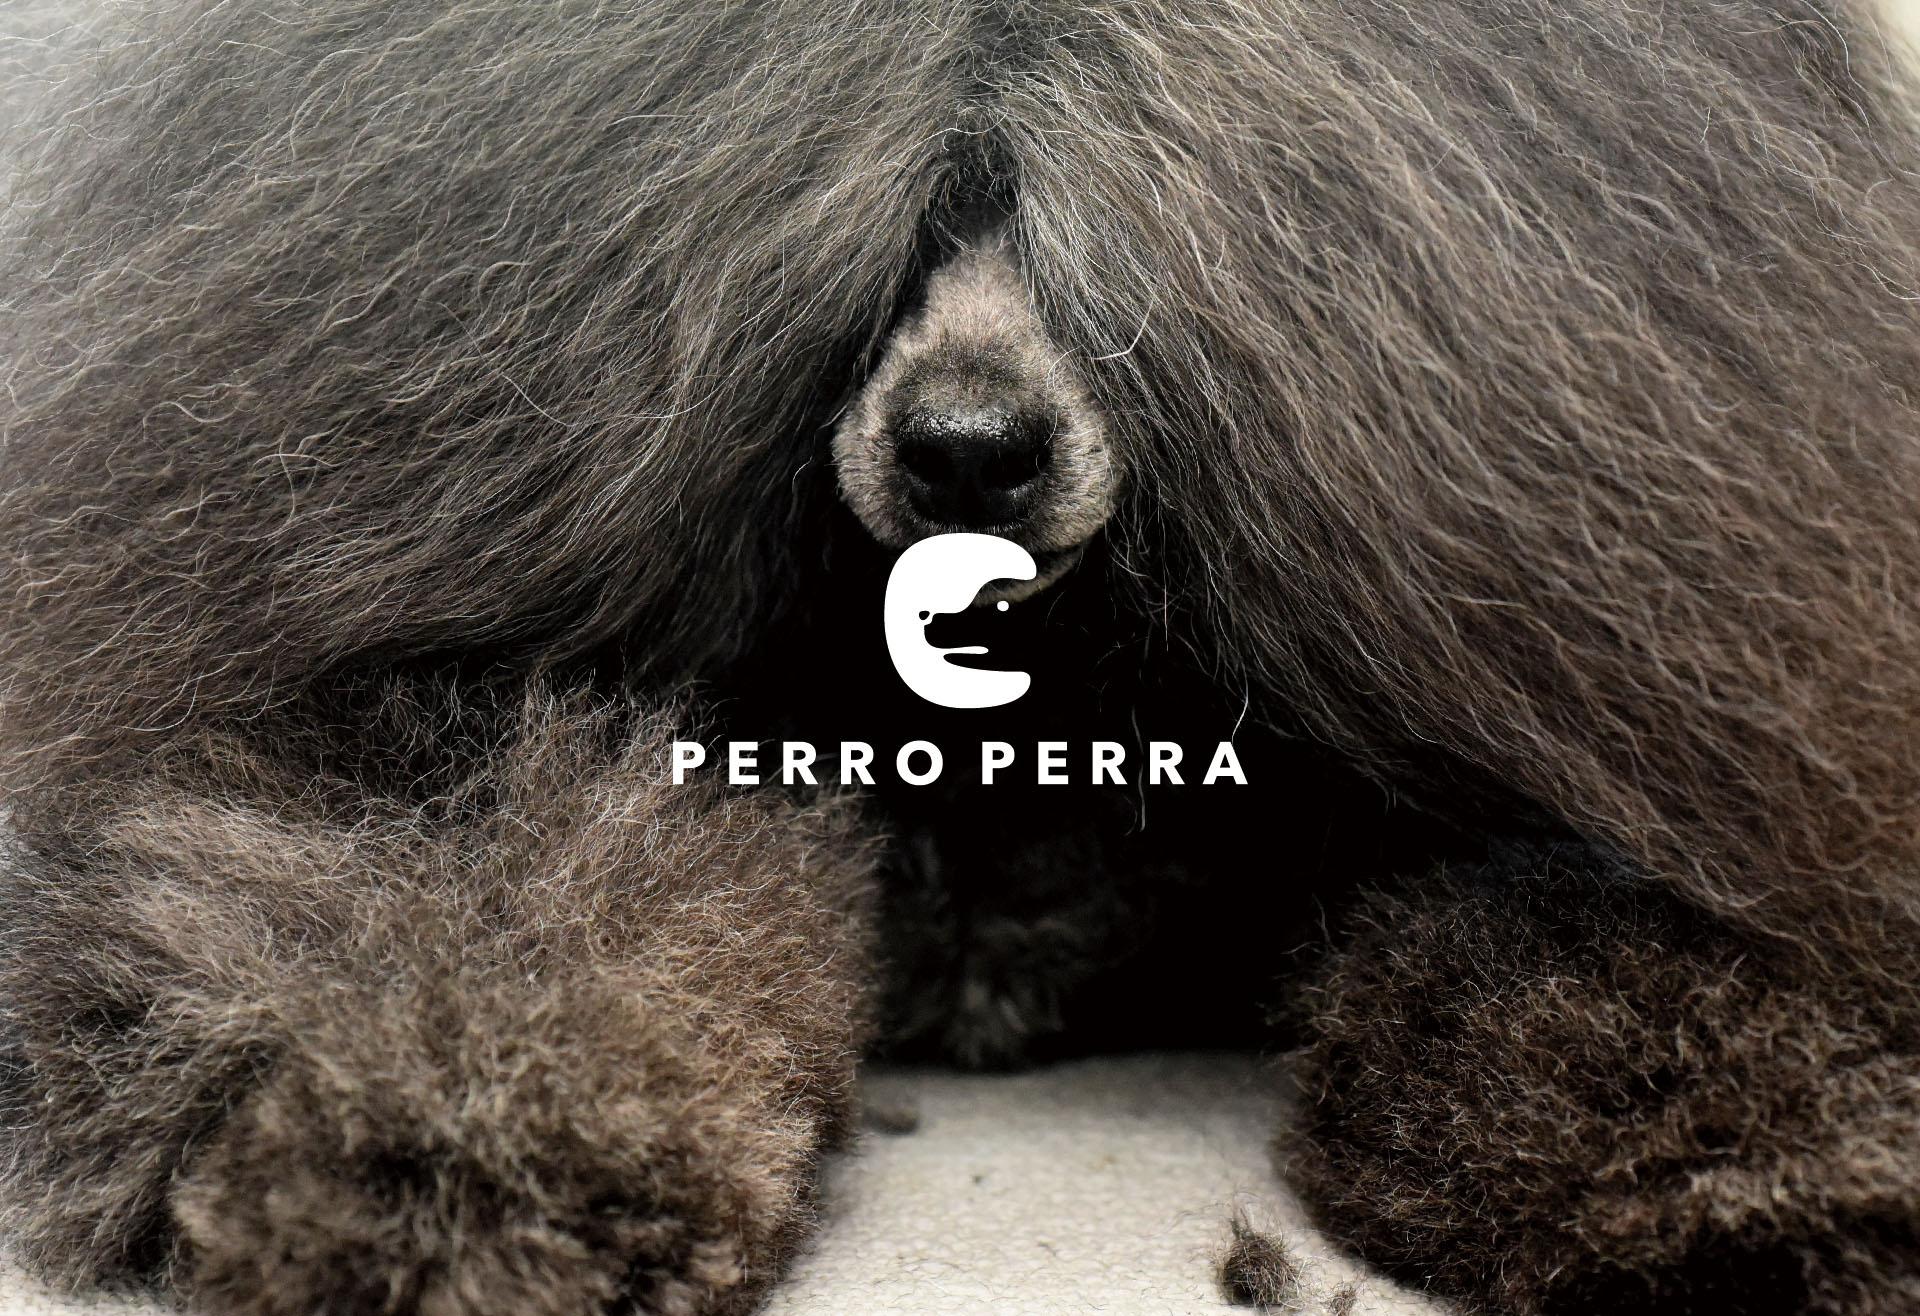 PERRO PERRA